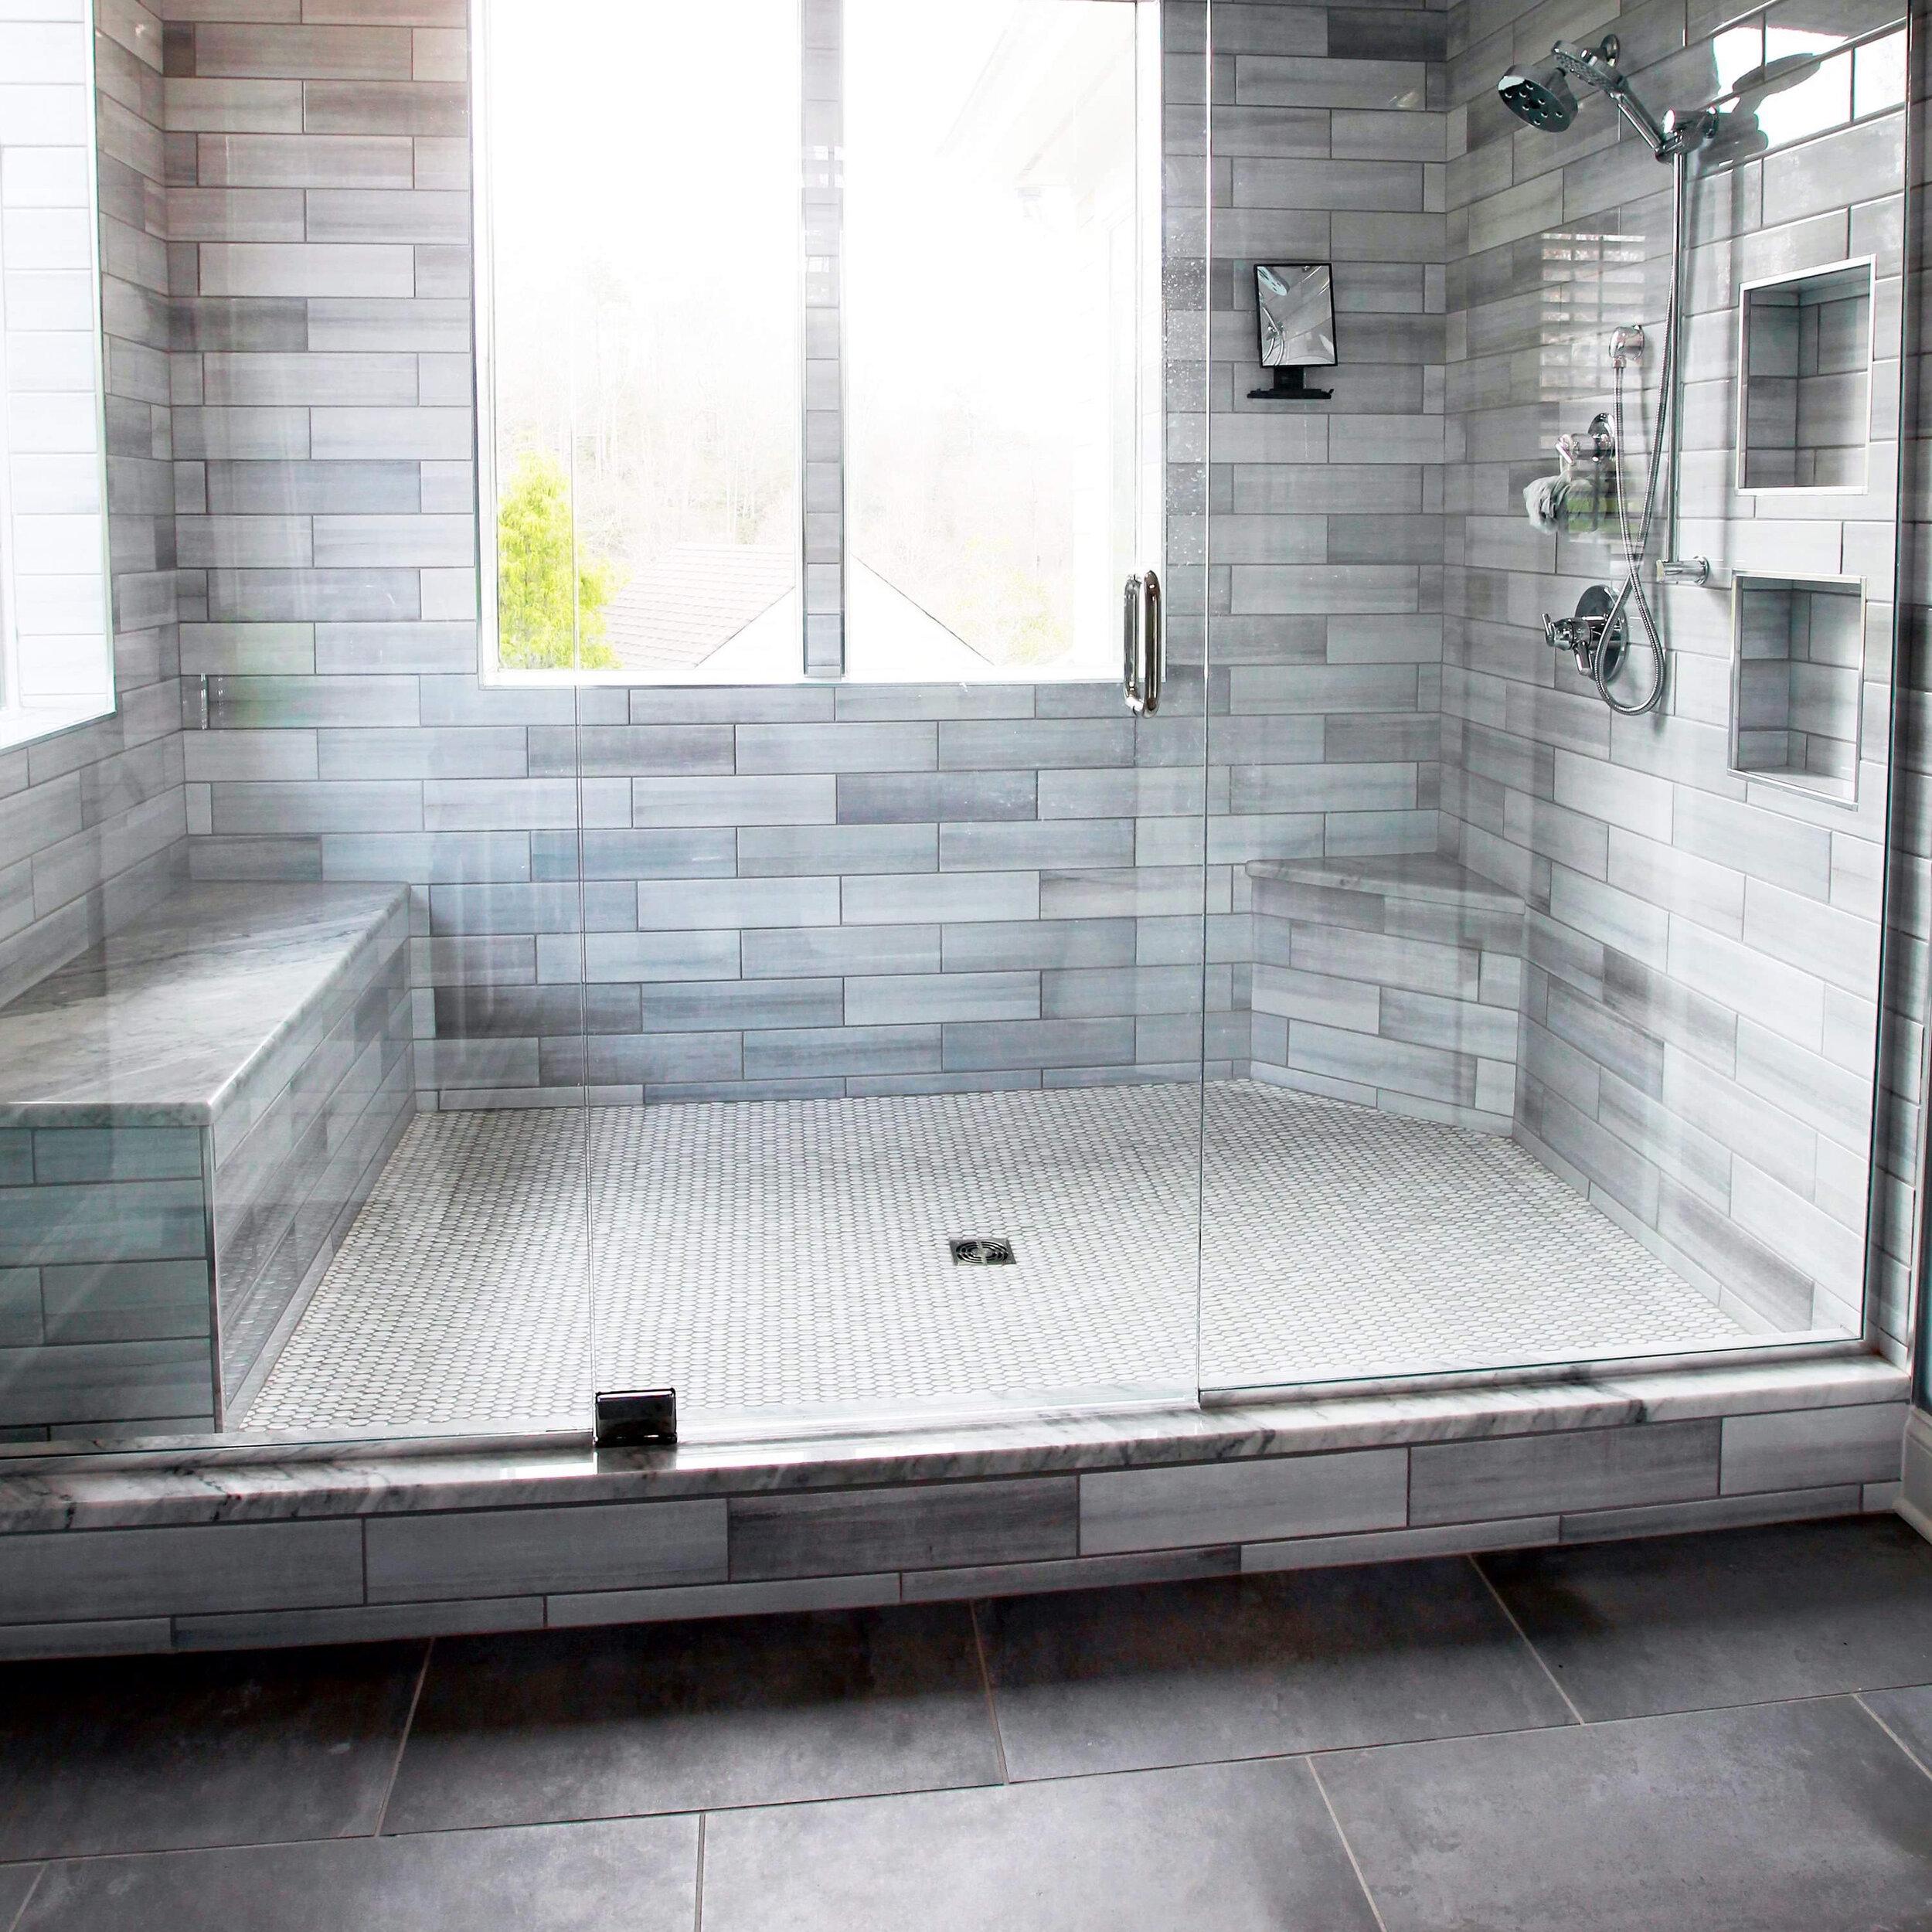 Bathroom Remodeling Lockwood S Carpets